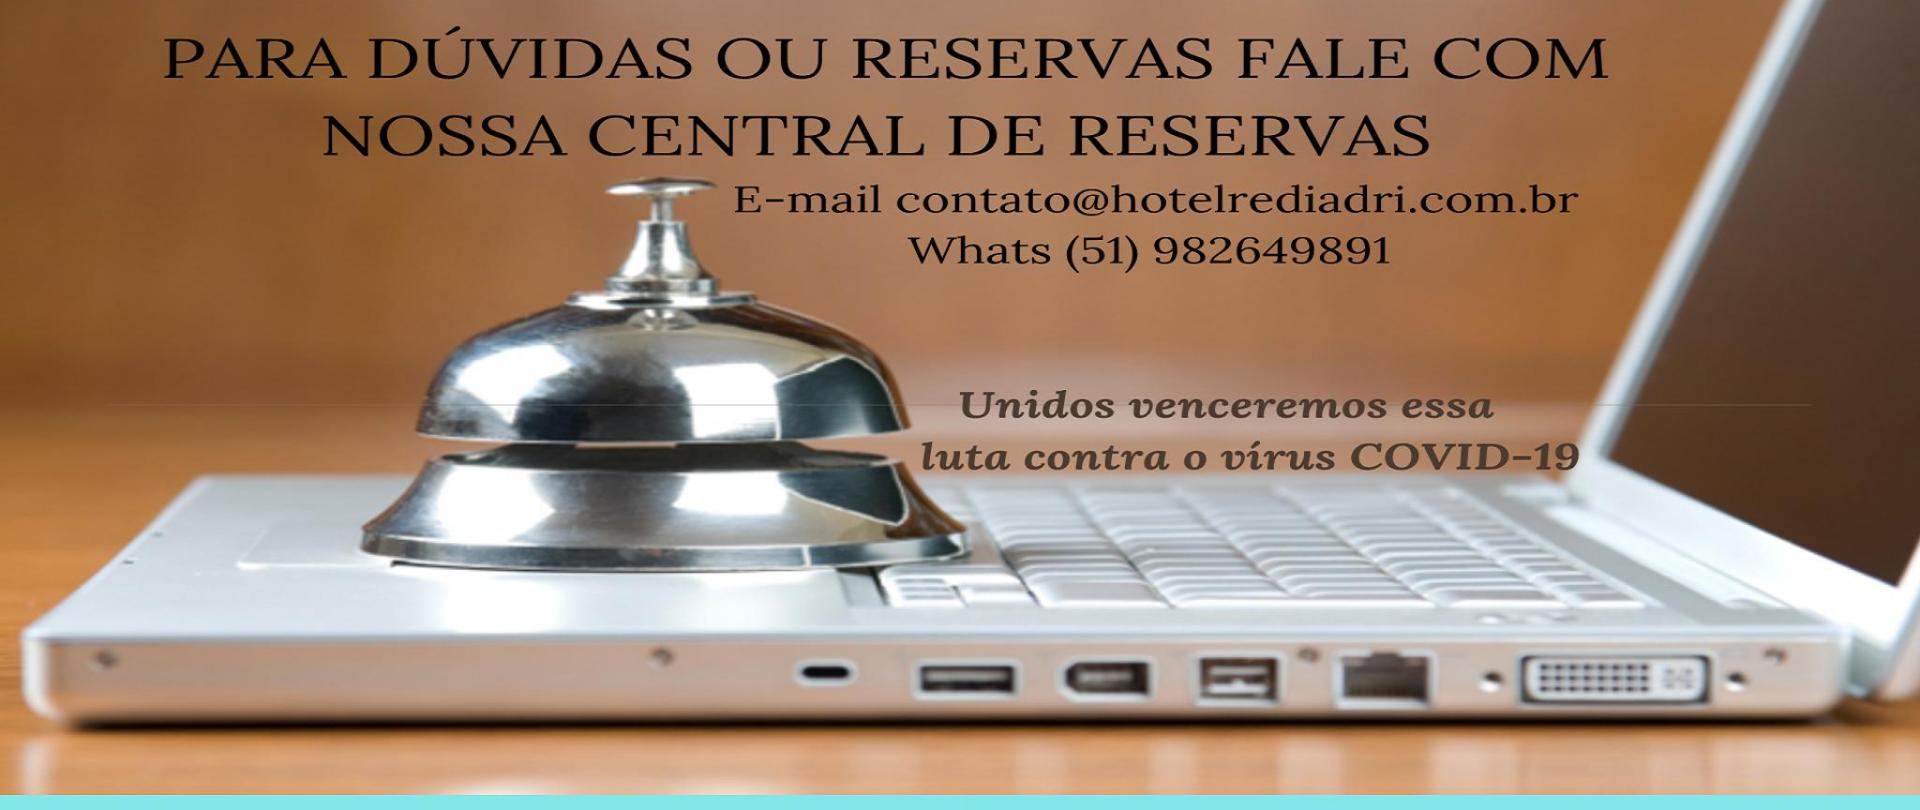 reservas!.png